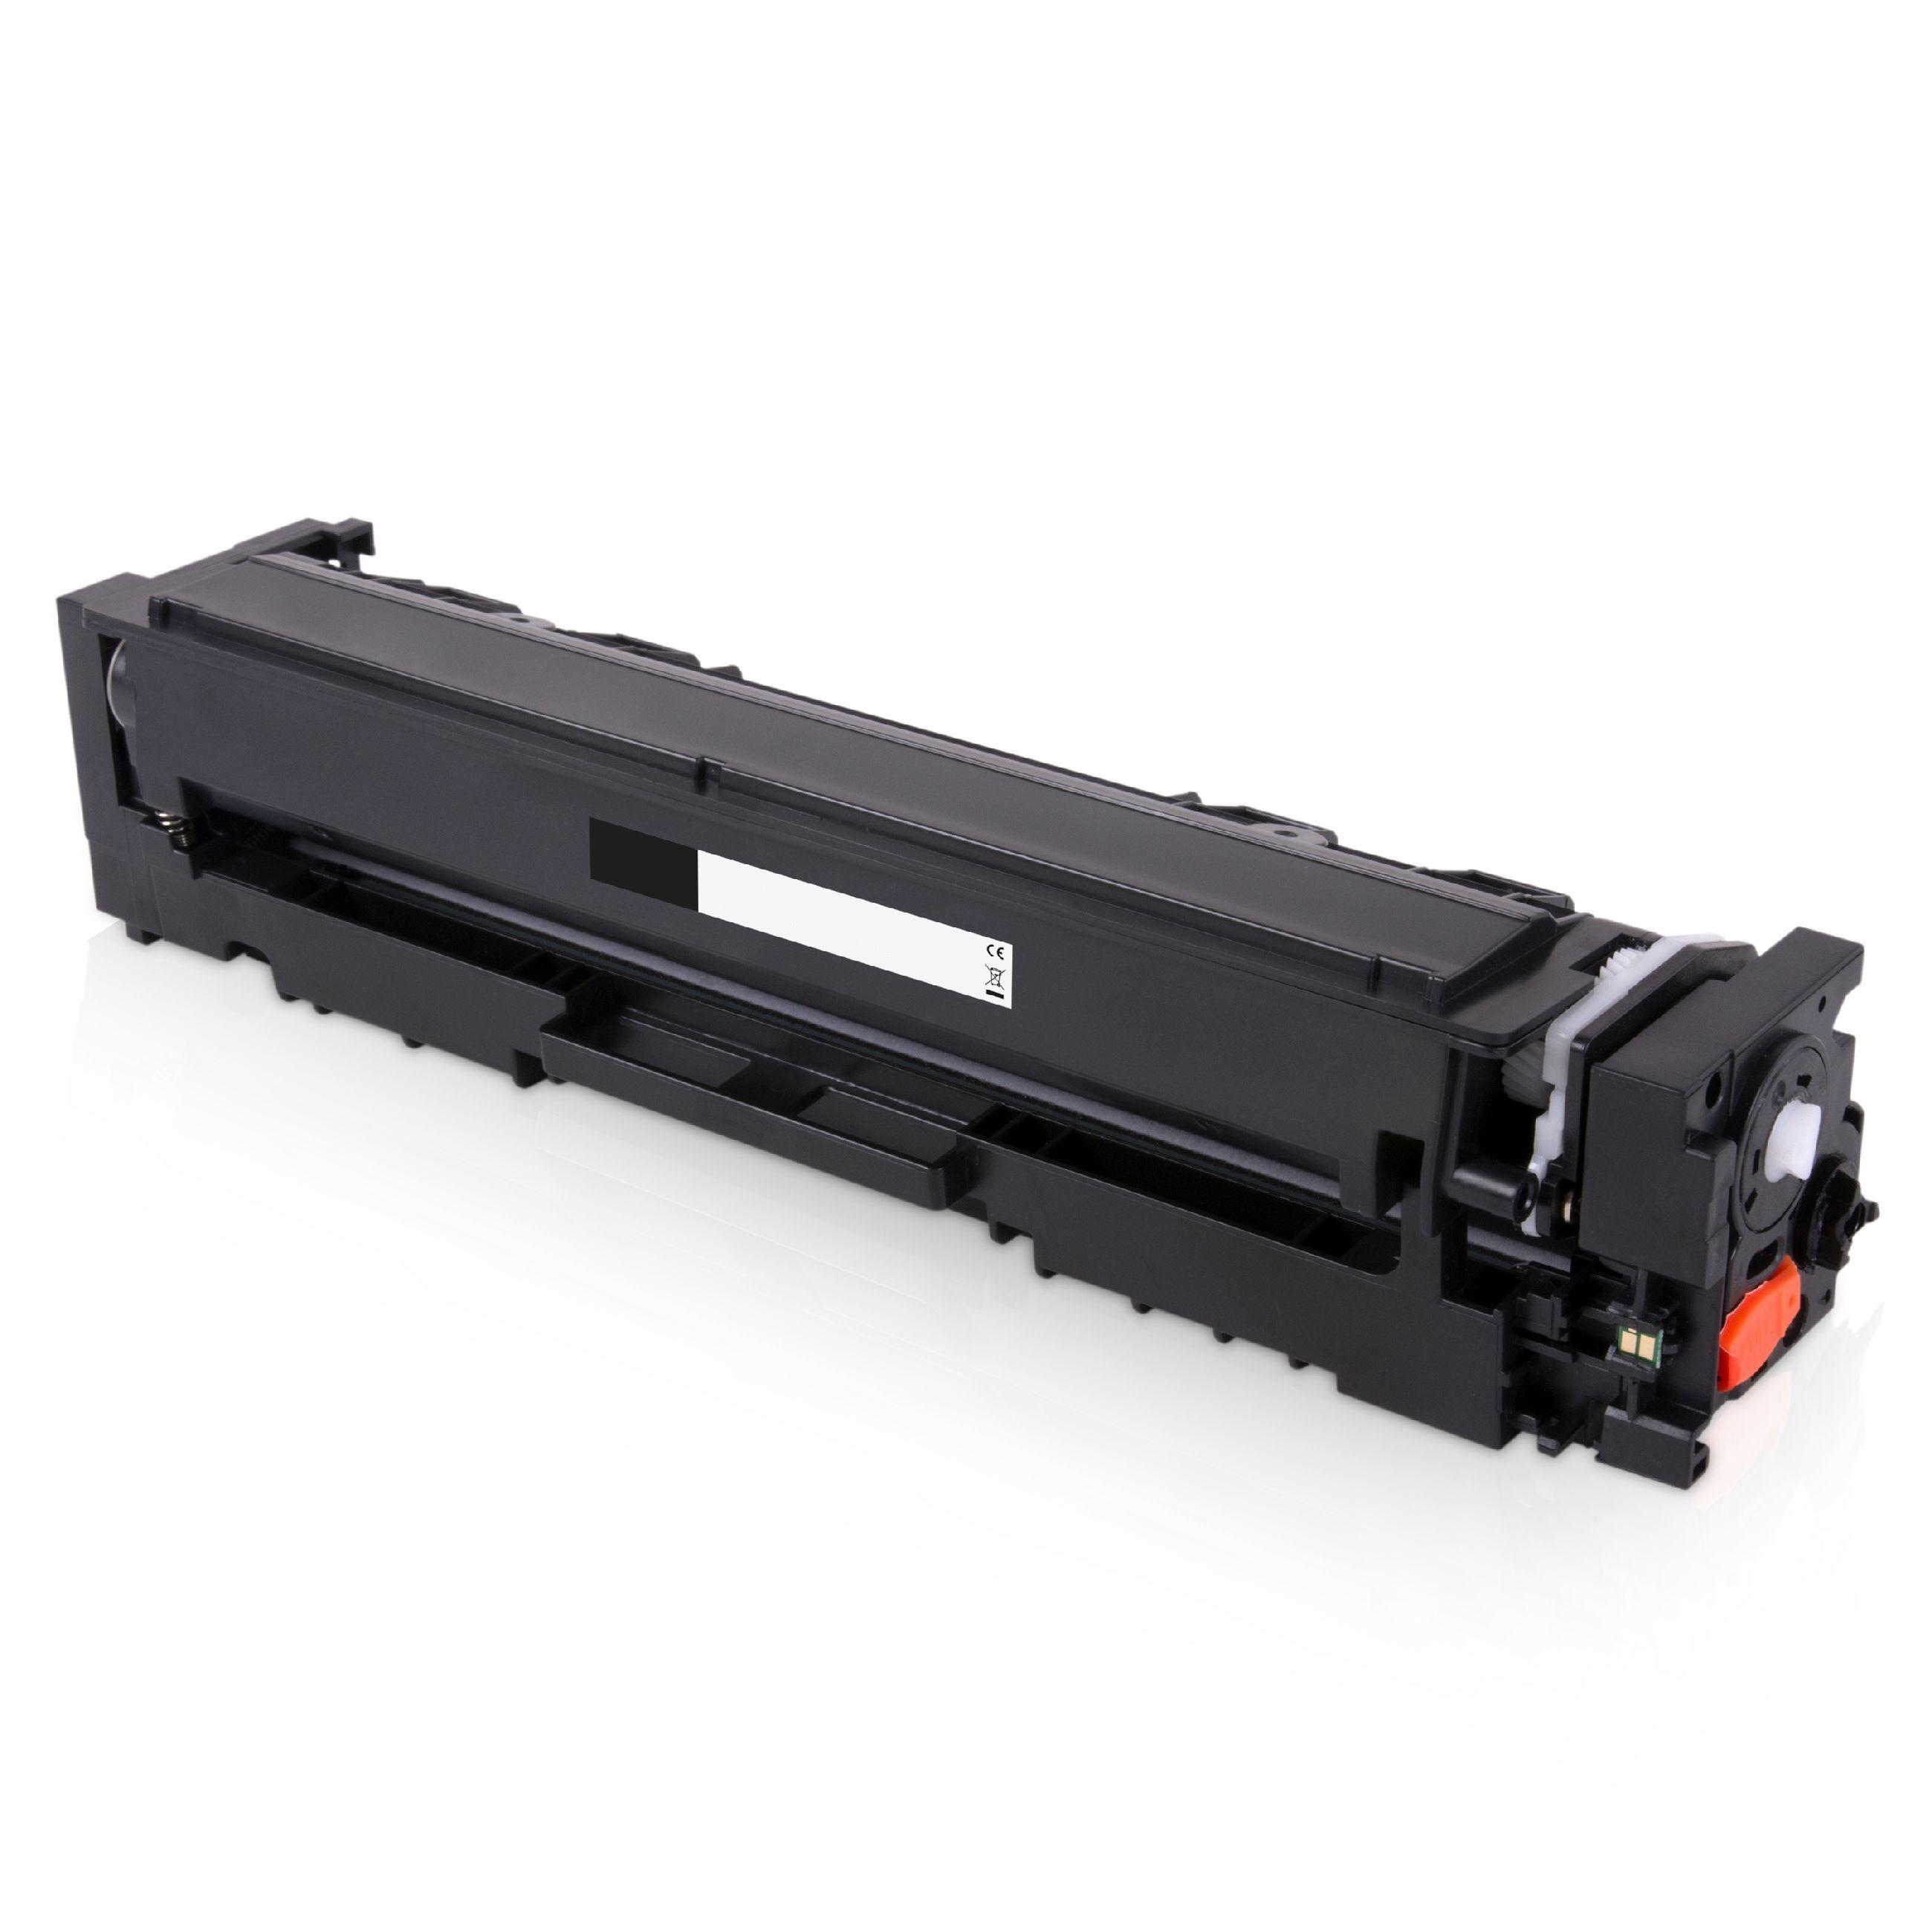 HP Cartouche de Toner pour HP CF540A / 203A noir compatible (de marque ASC)